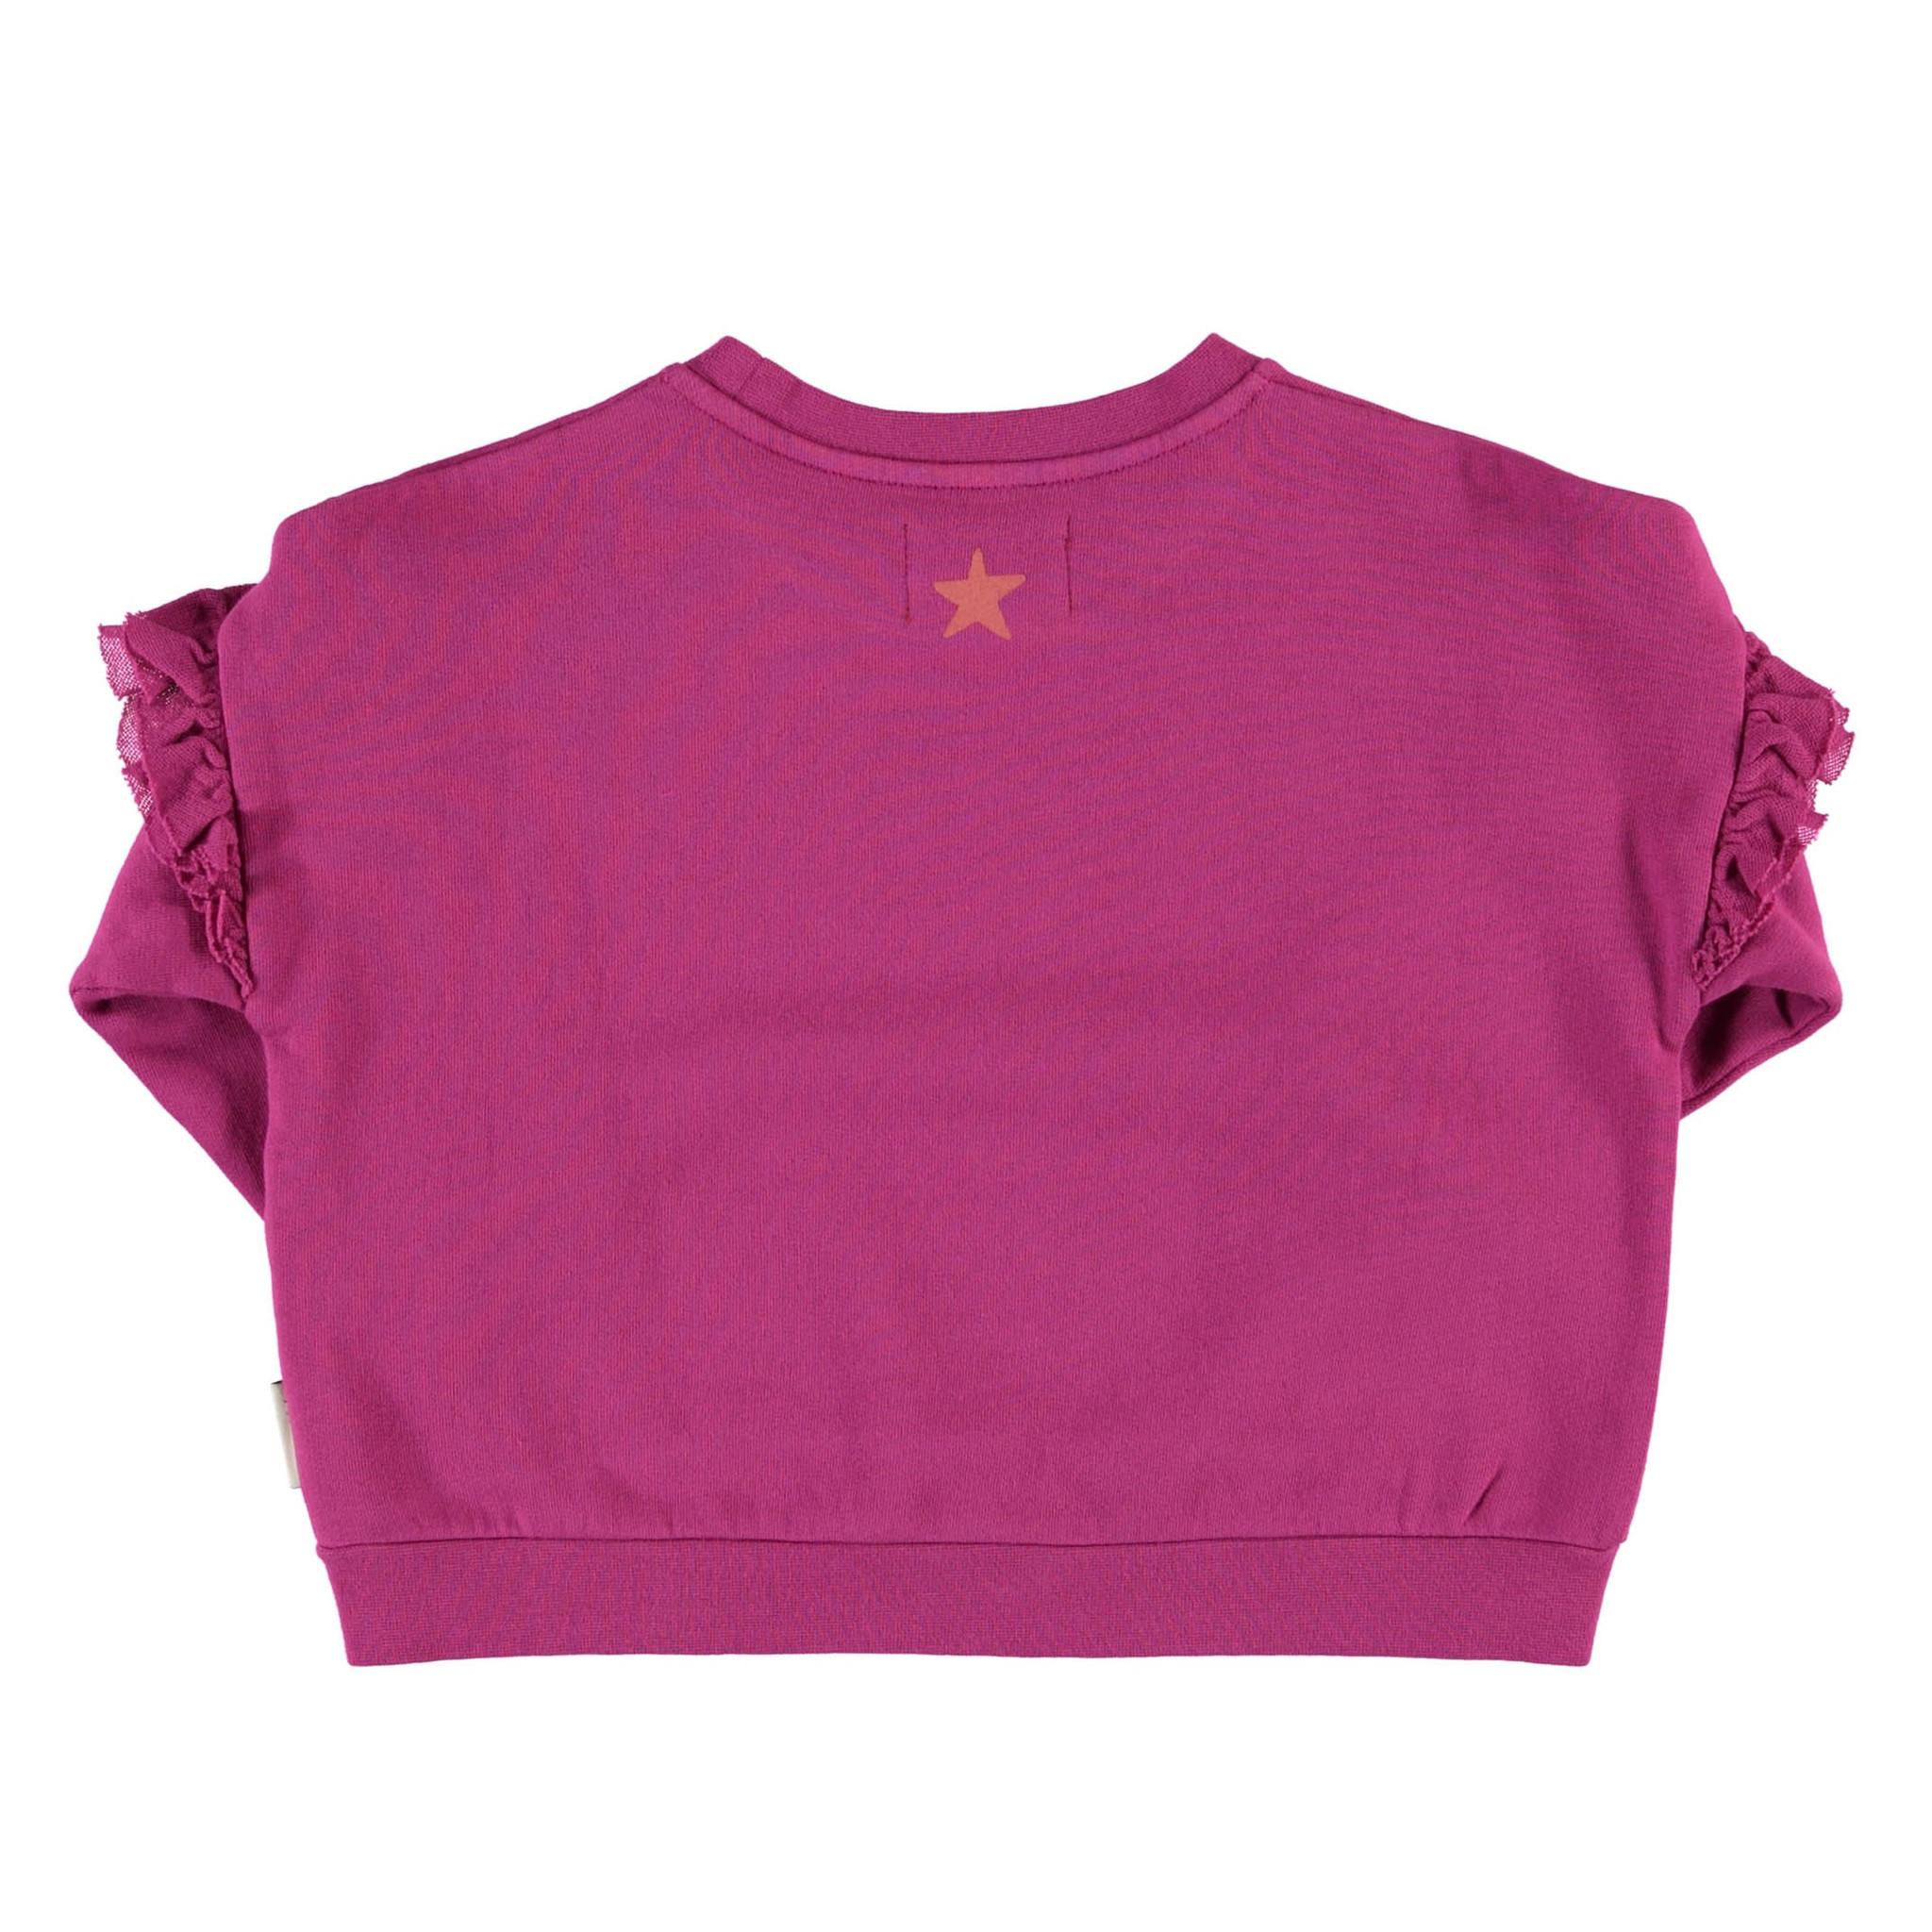 "sweatshirt w/ frills on shoulders | fuchsia w/ ""the breakfast club"" print-2"